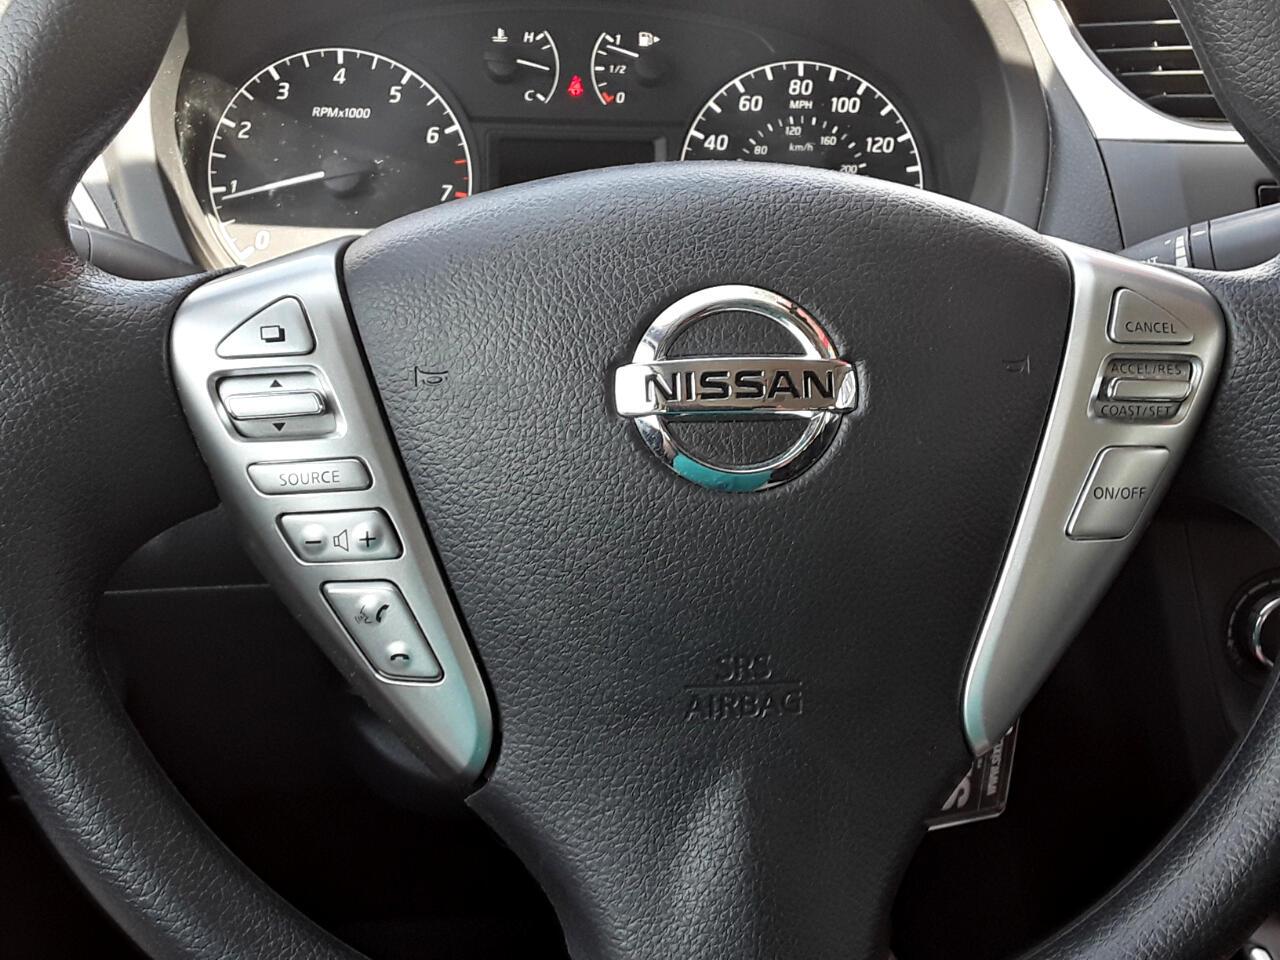 2017 Nissan Sentra 4dr Sdn I4 CVT S